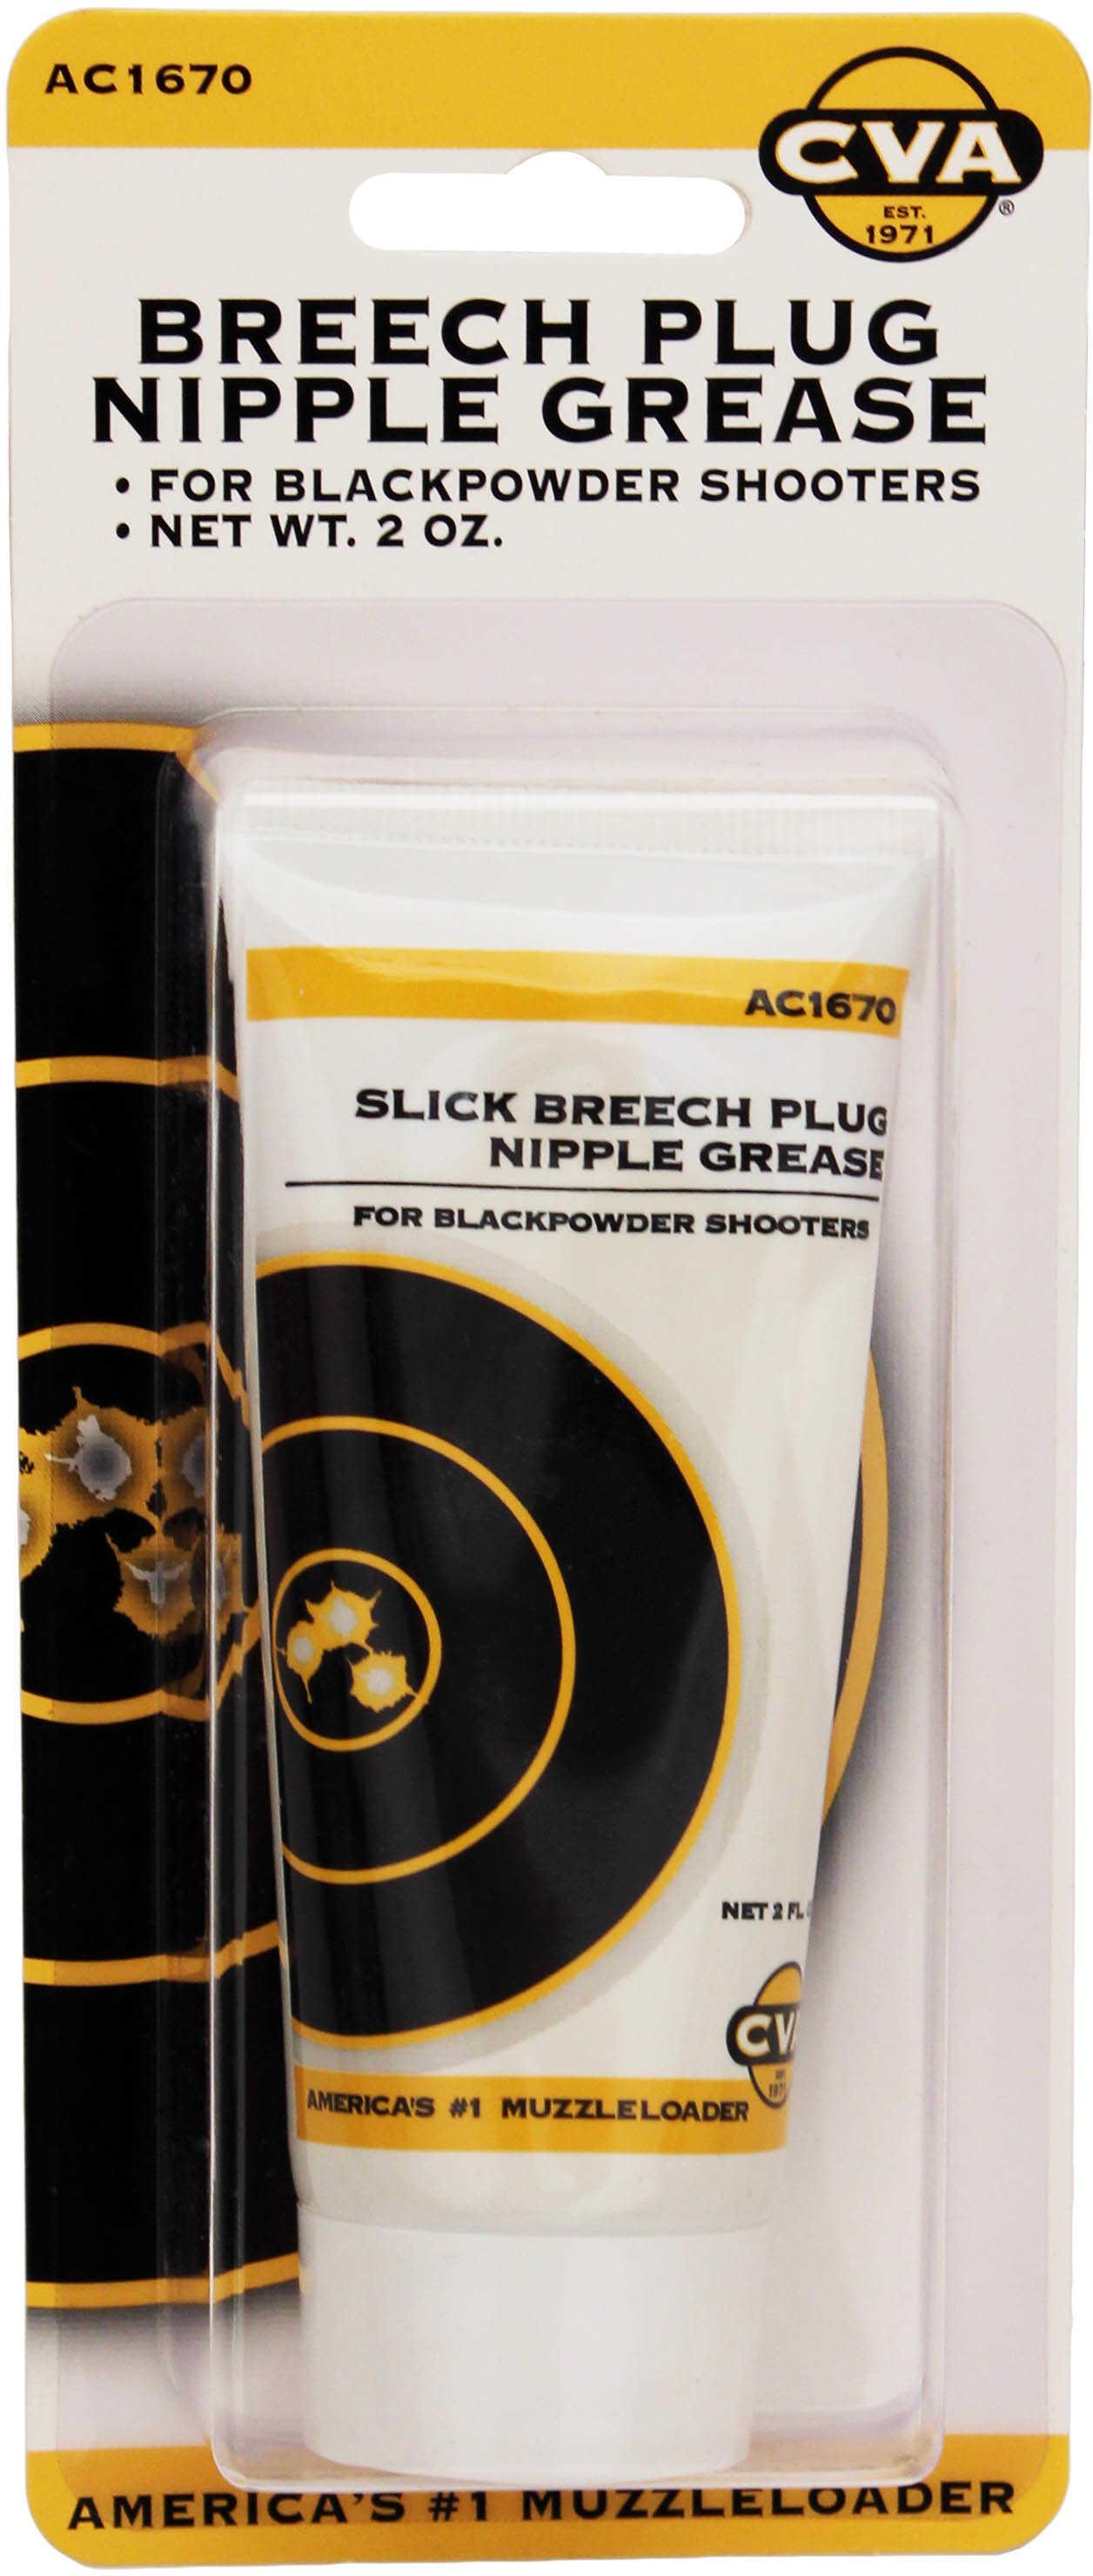 CVA Breech Plug/Nipple Grease Model: AC1670